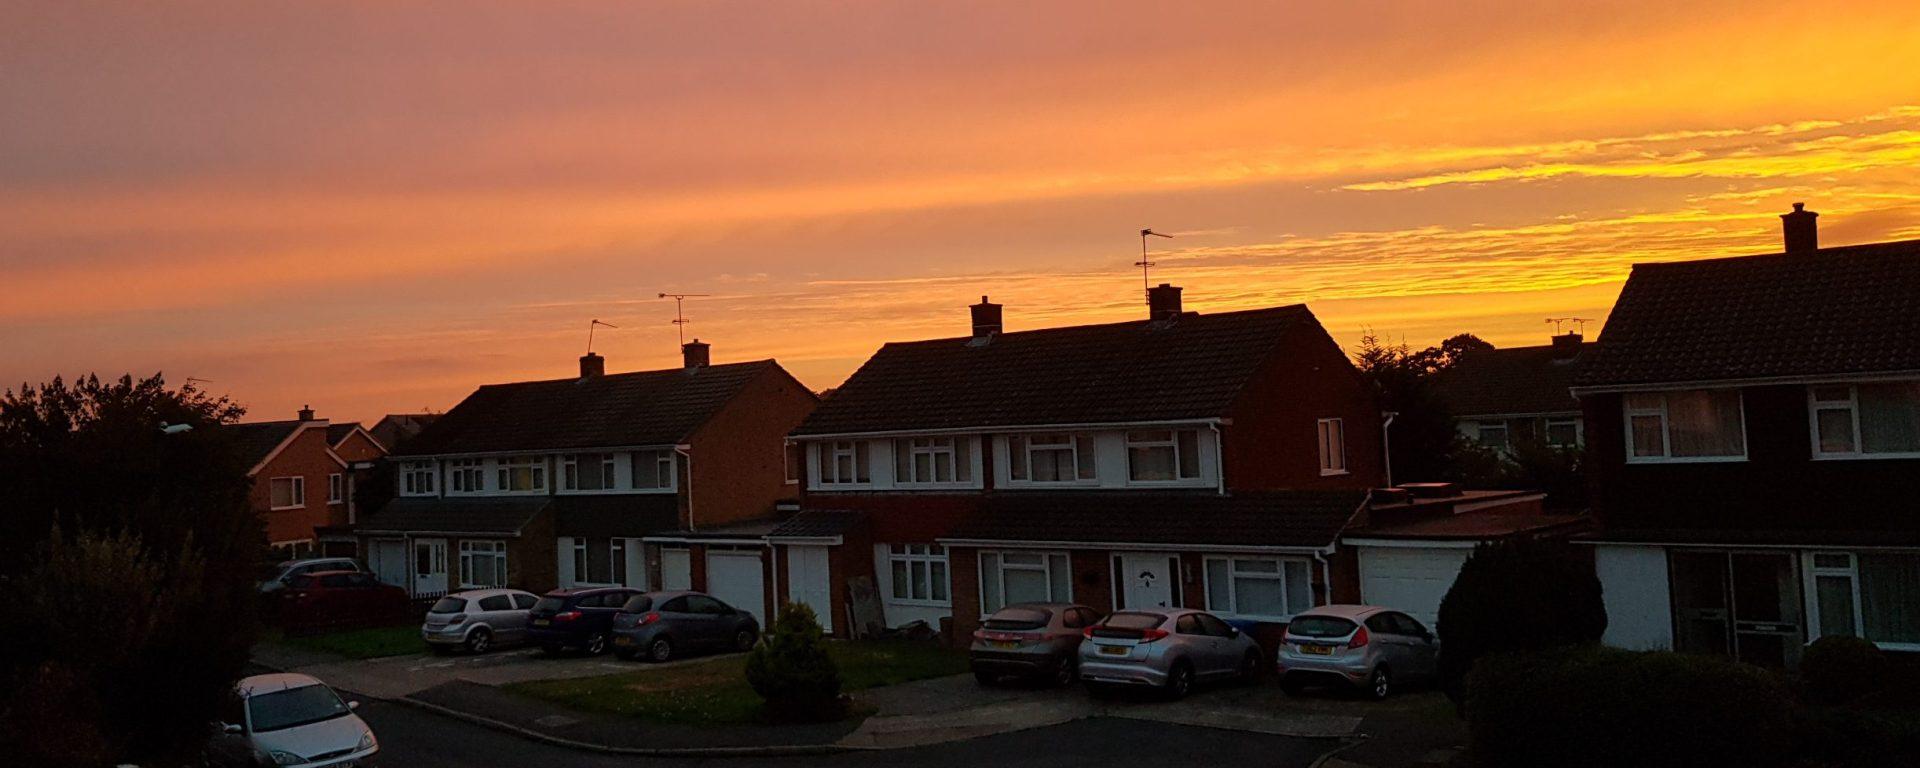 sunrise over dedworth